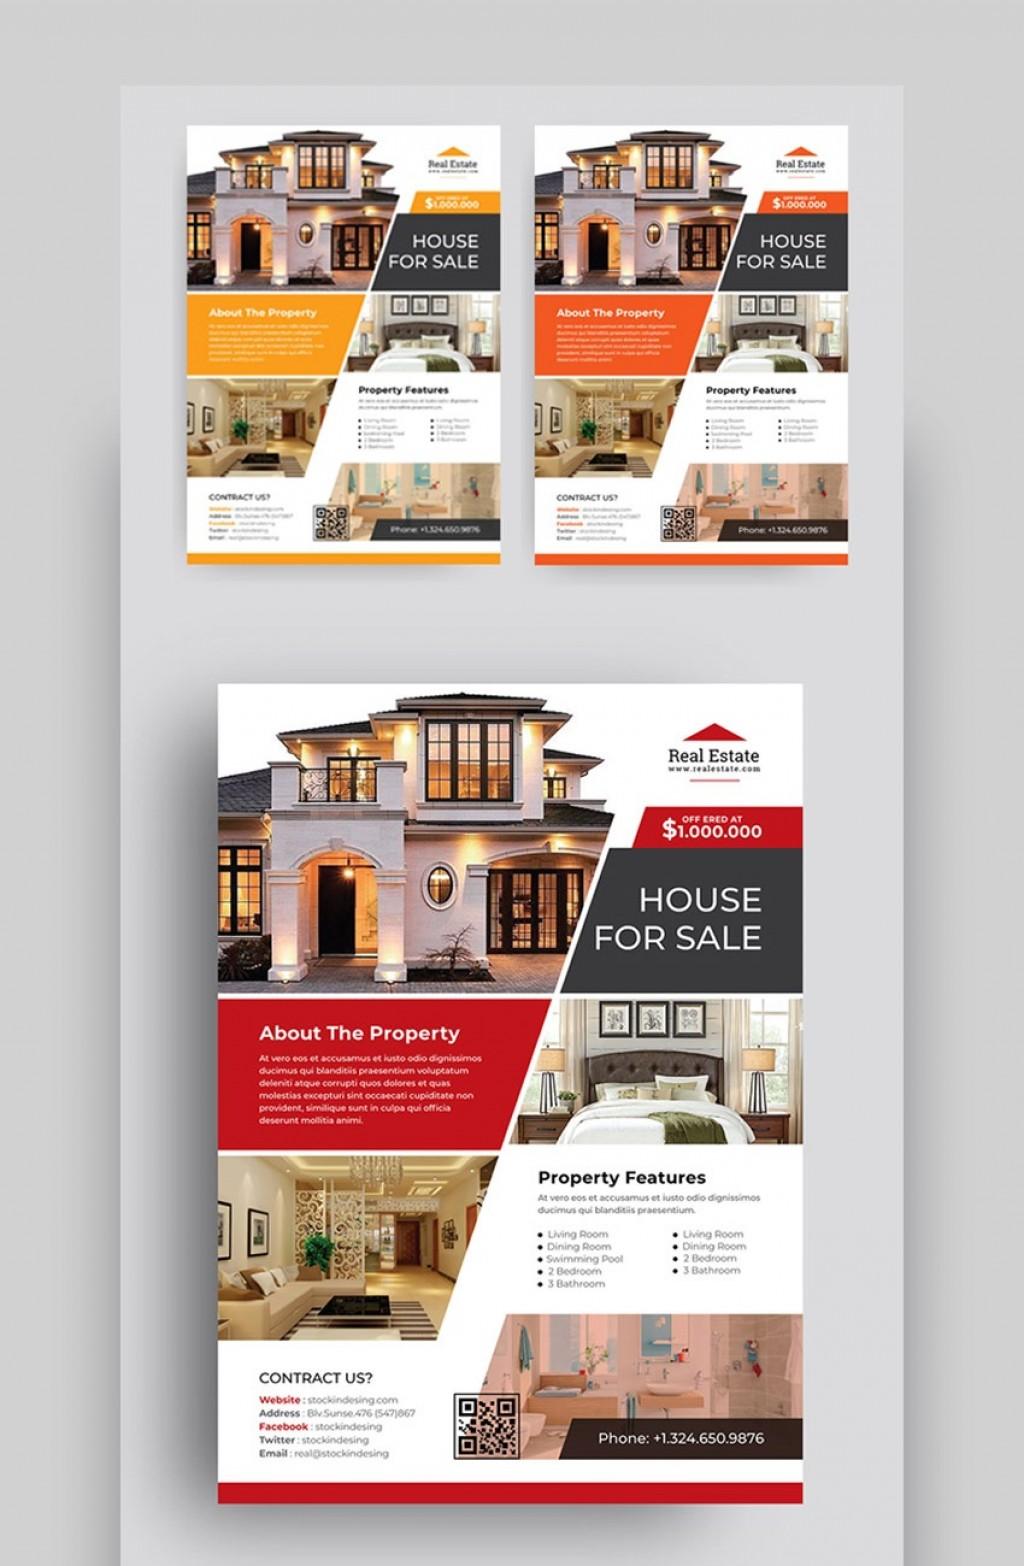 007 Sensational Real Estate Marketing Flyer Template Free Highest Clarity Large